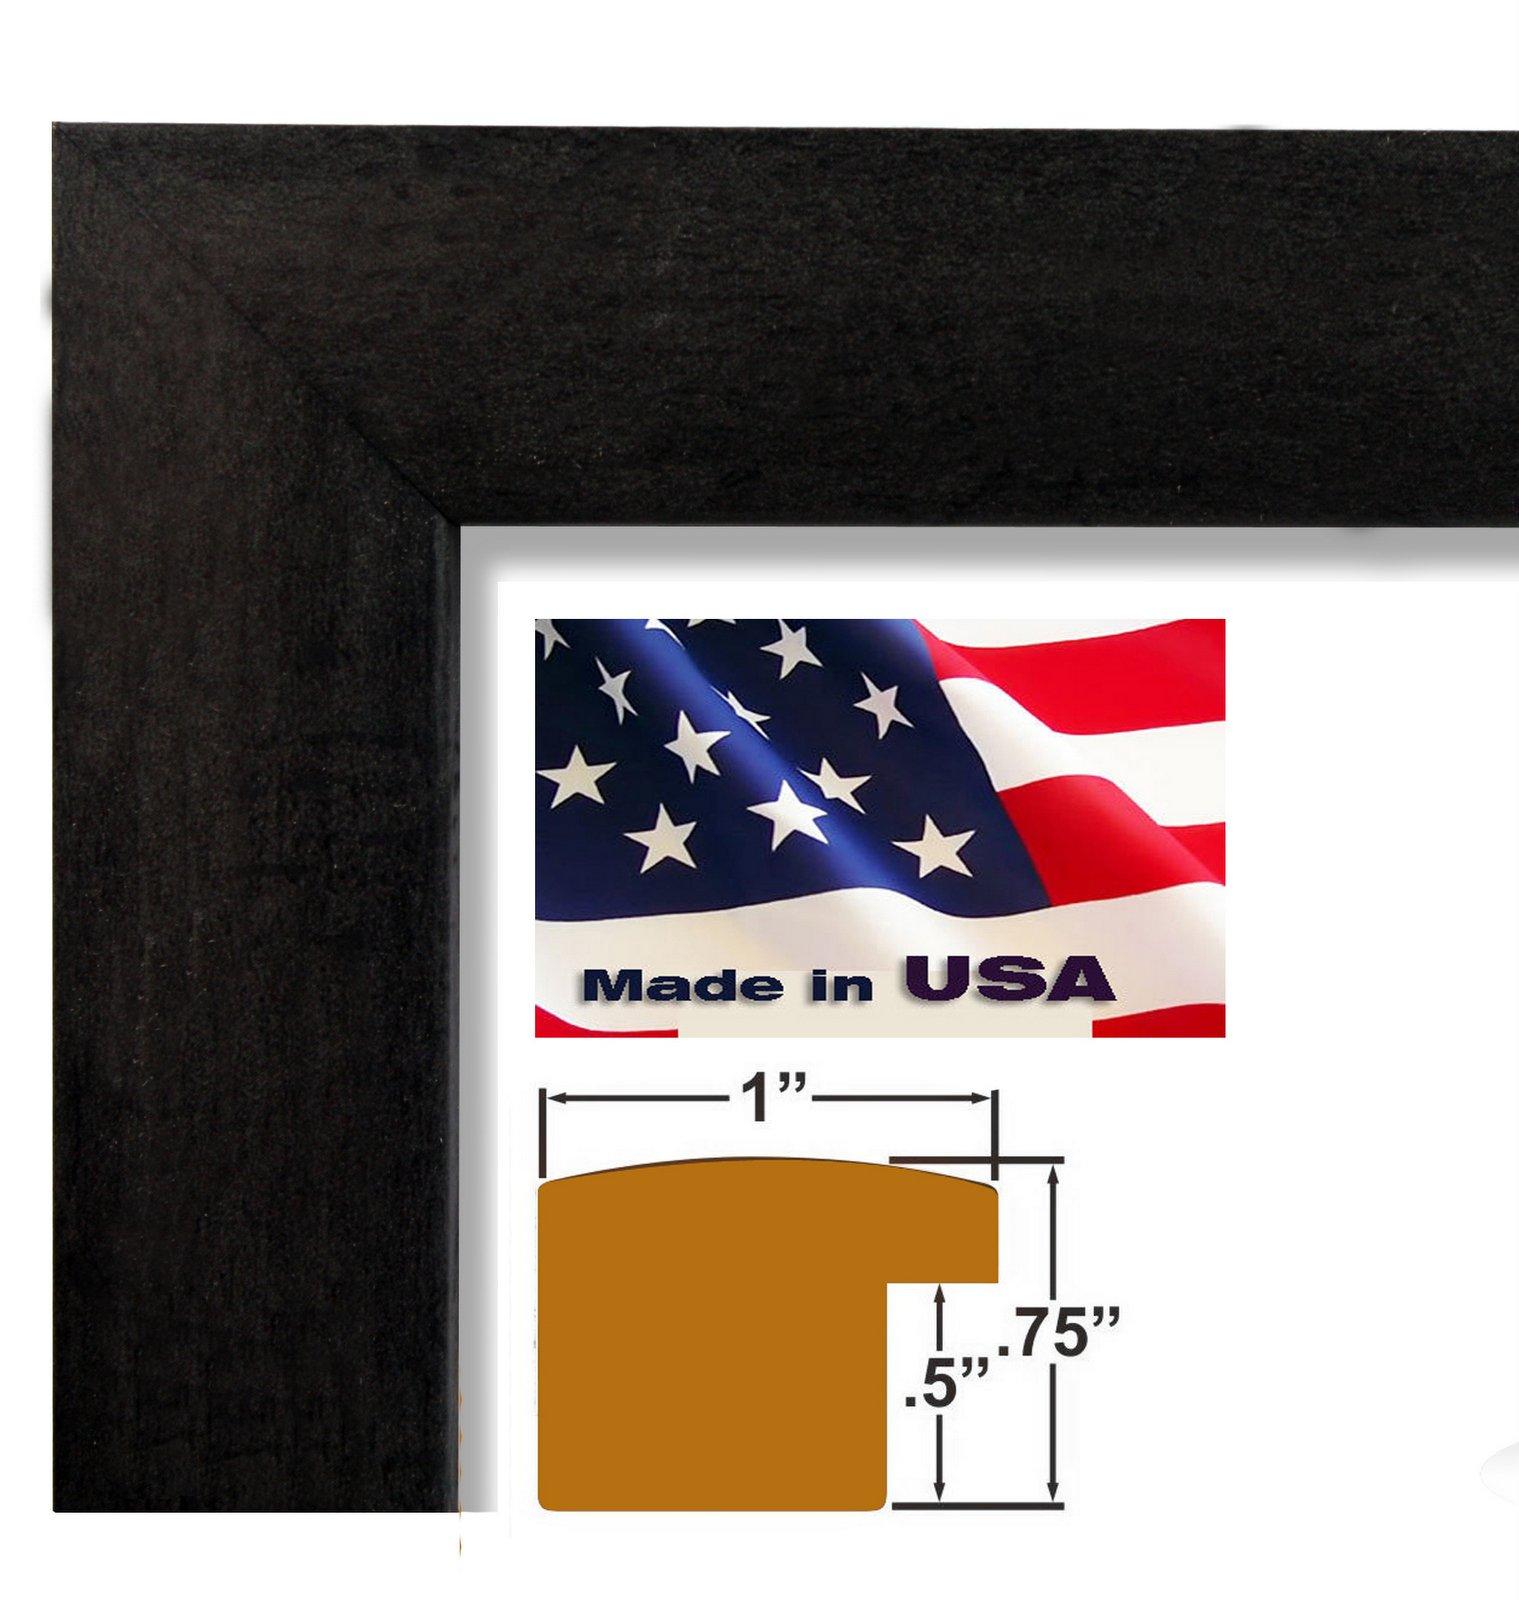 US Art Frames 17x22 Black 1 Inch, Nugget MDF Wood Composite Picture Poster Frame